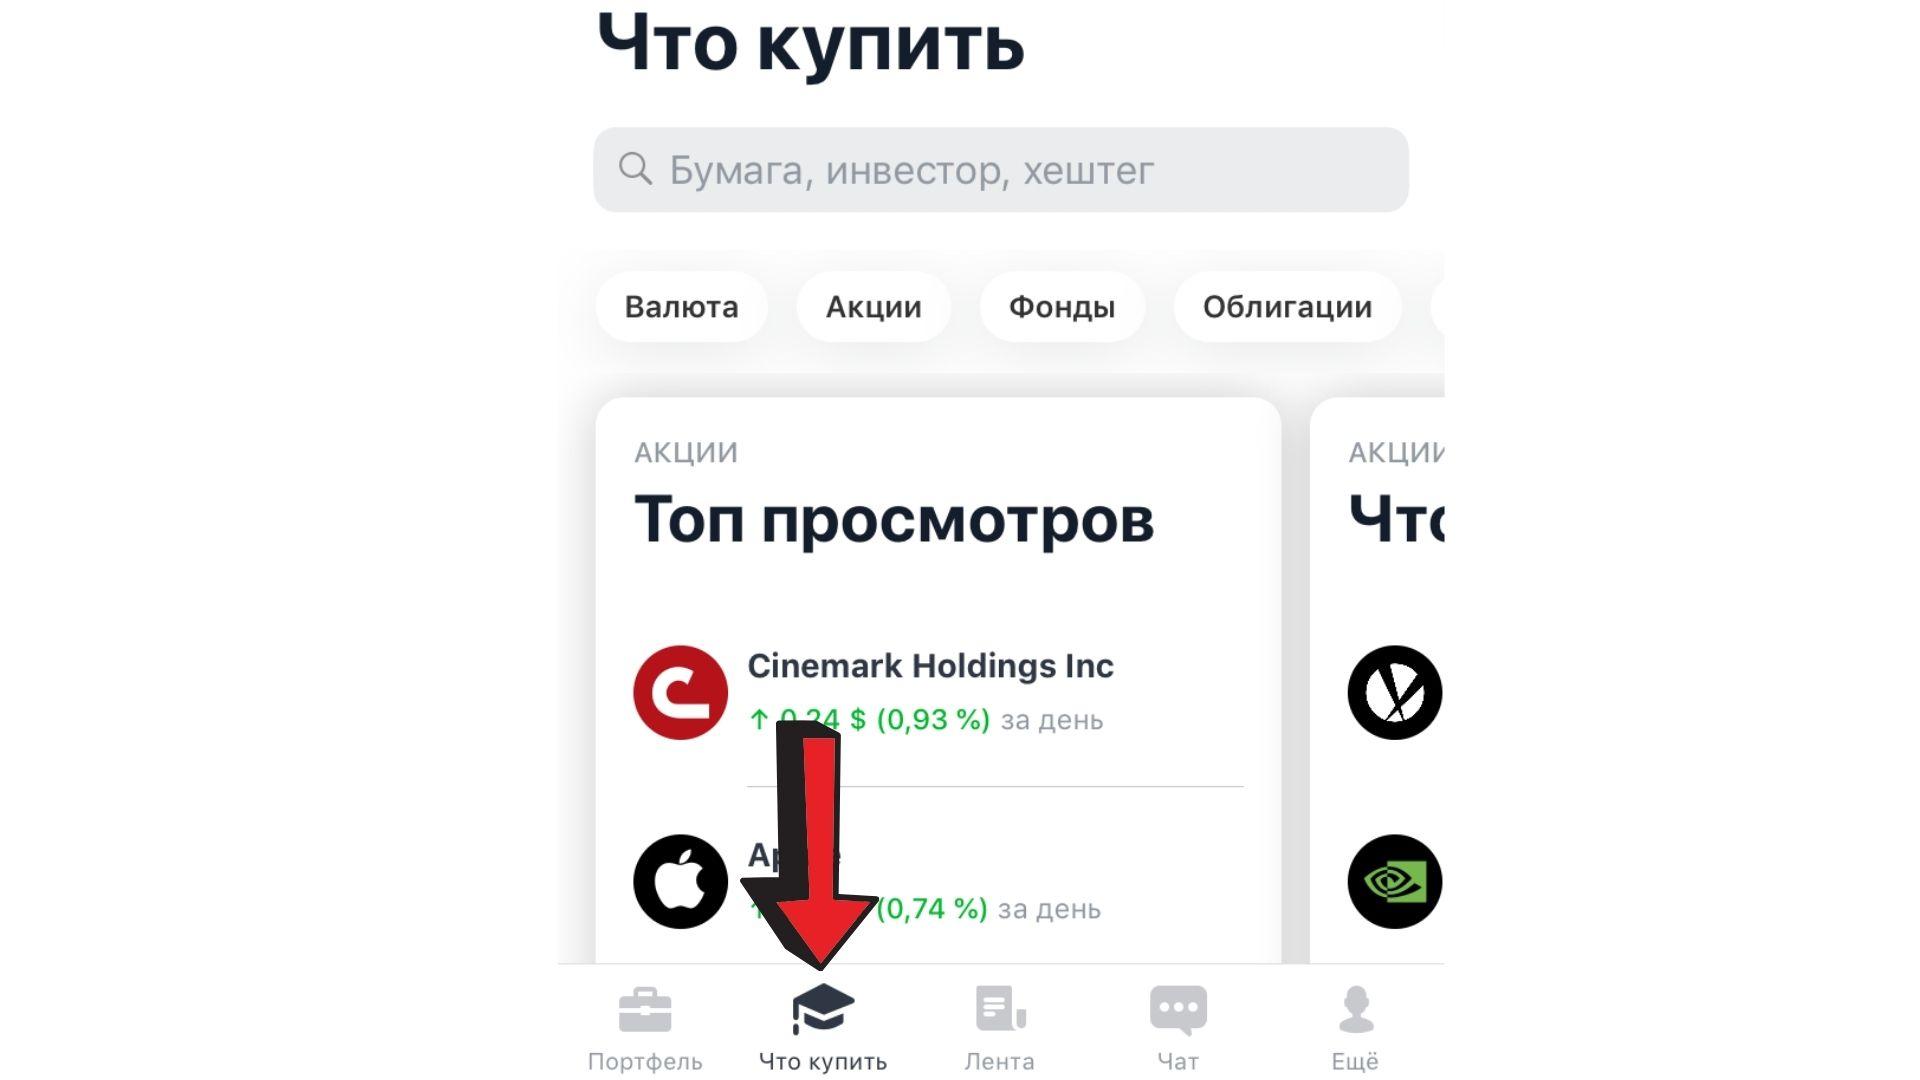 Как купить акции Тесла через Тинькофф Инвестиции